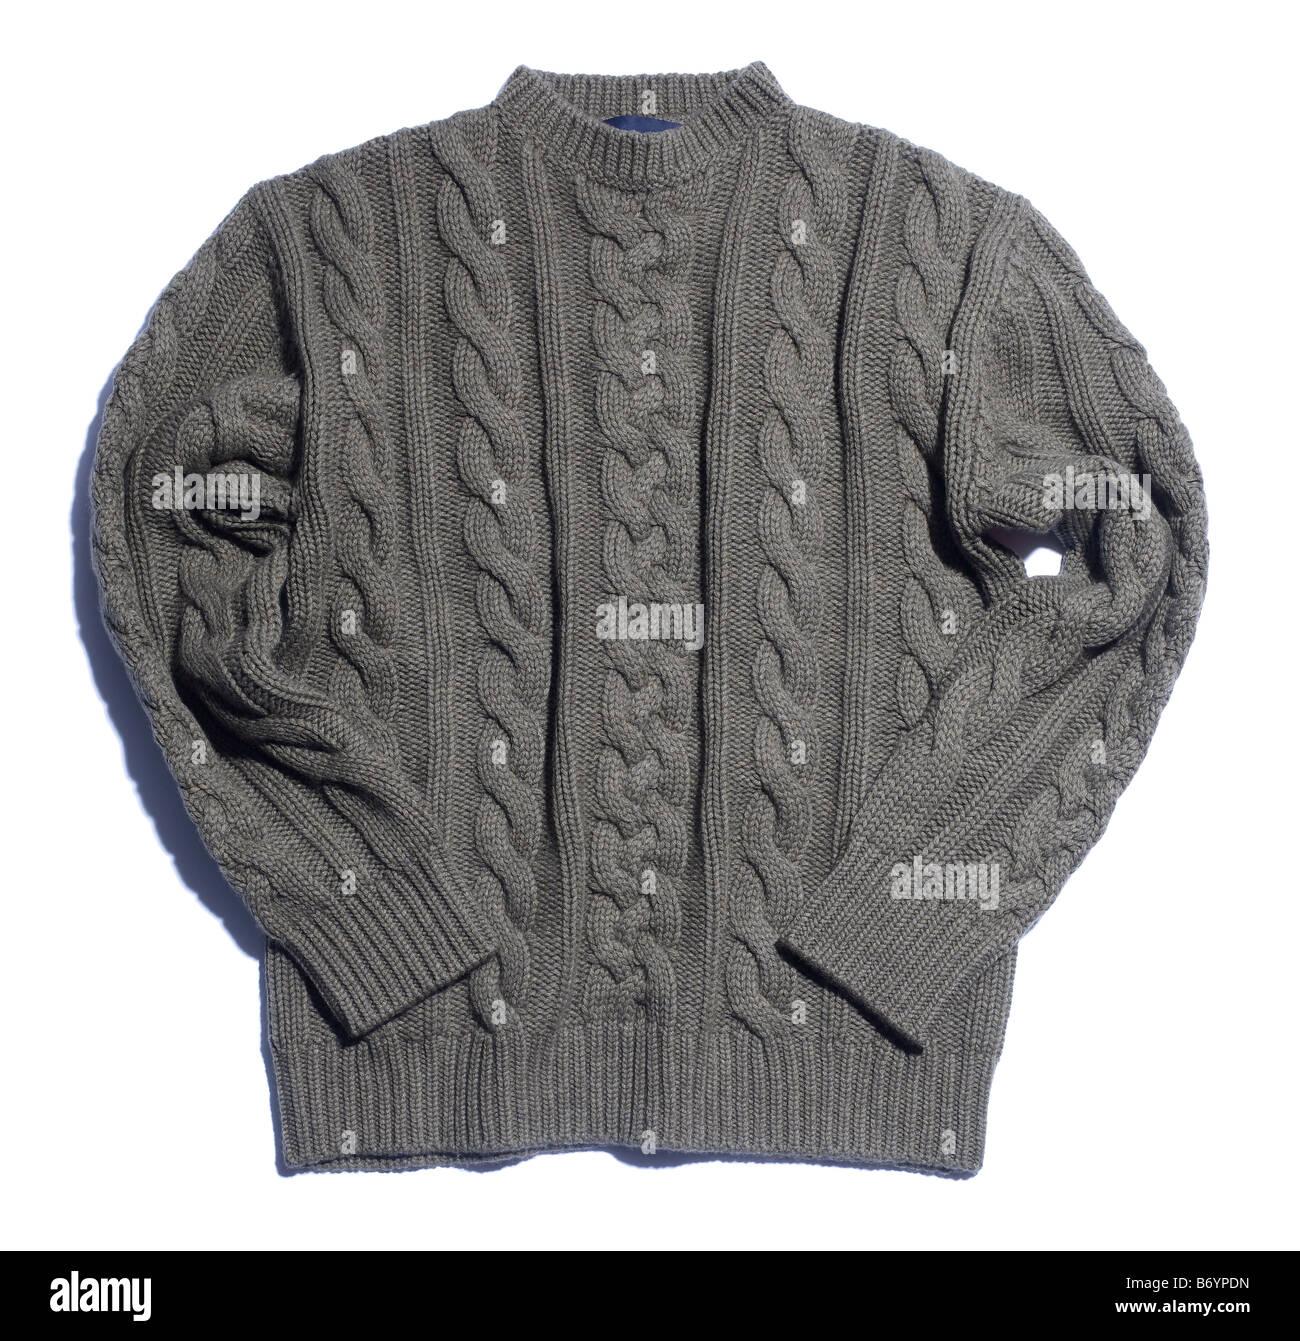 Jersey de lana tejida de cable puente suéter Imagen De Stock